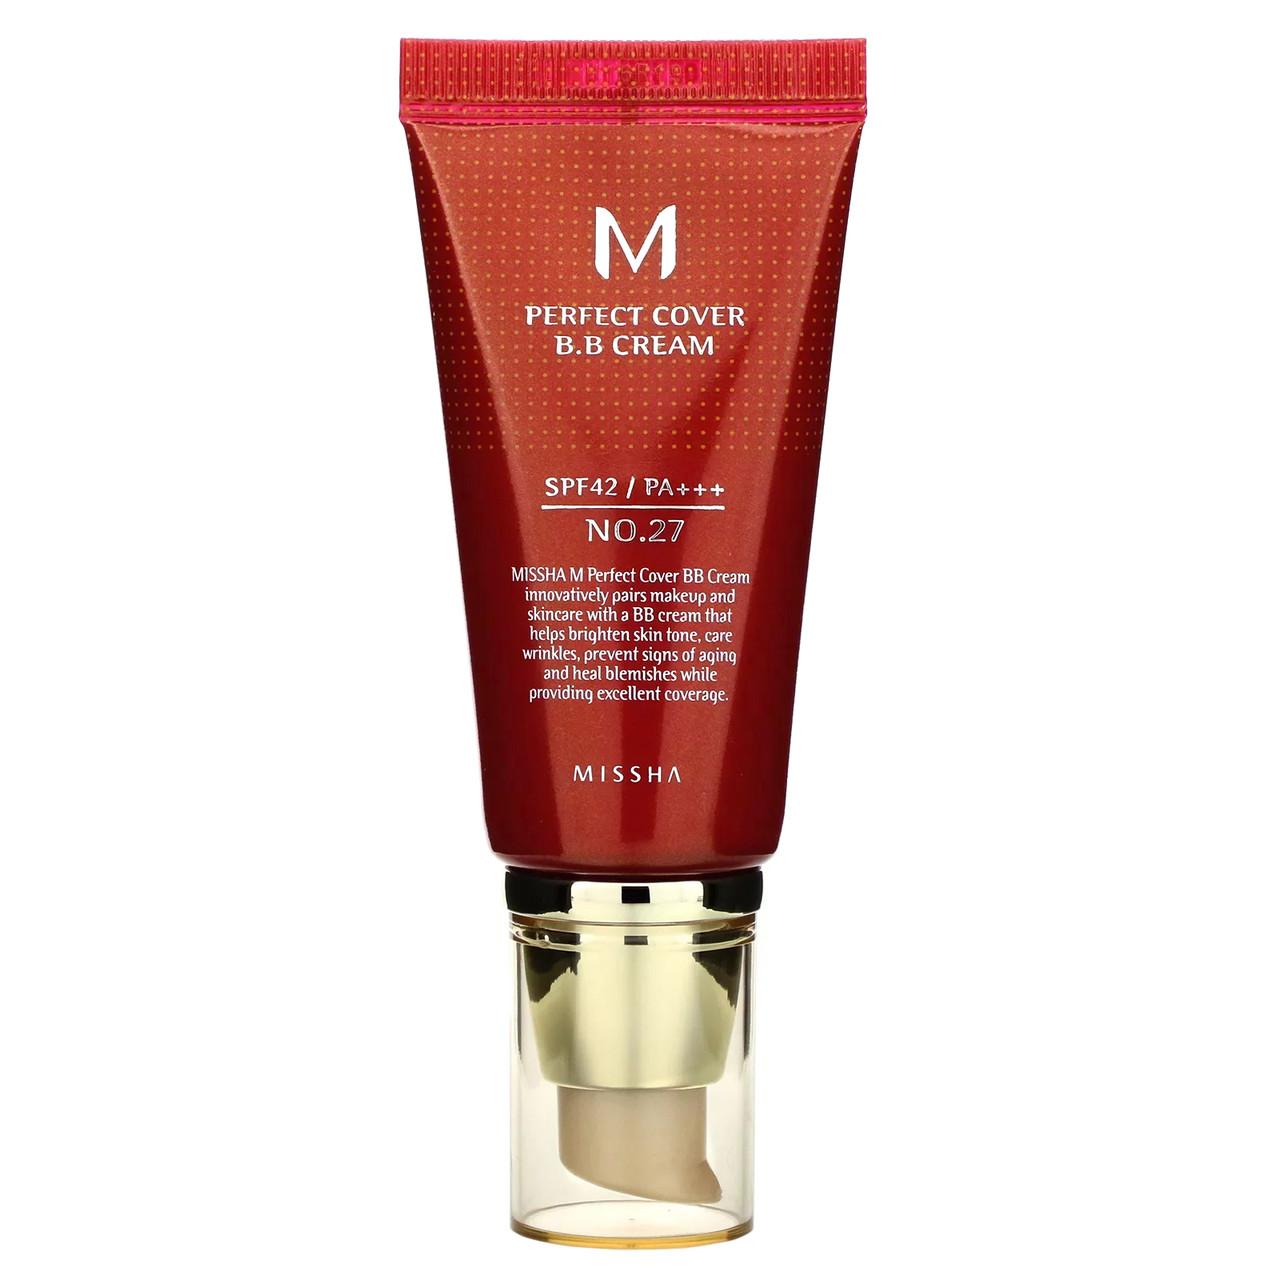 ВВ крем MISSHA M Perfect Cover BB Cream (SPF42/PA+++) #27 Honey Beige, 50 мл